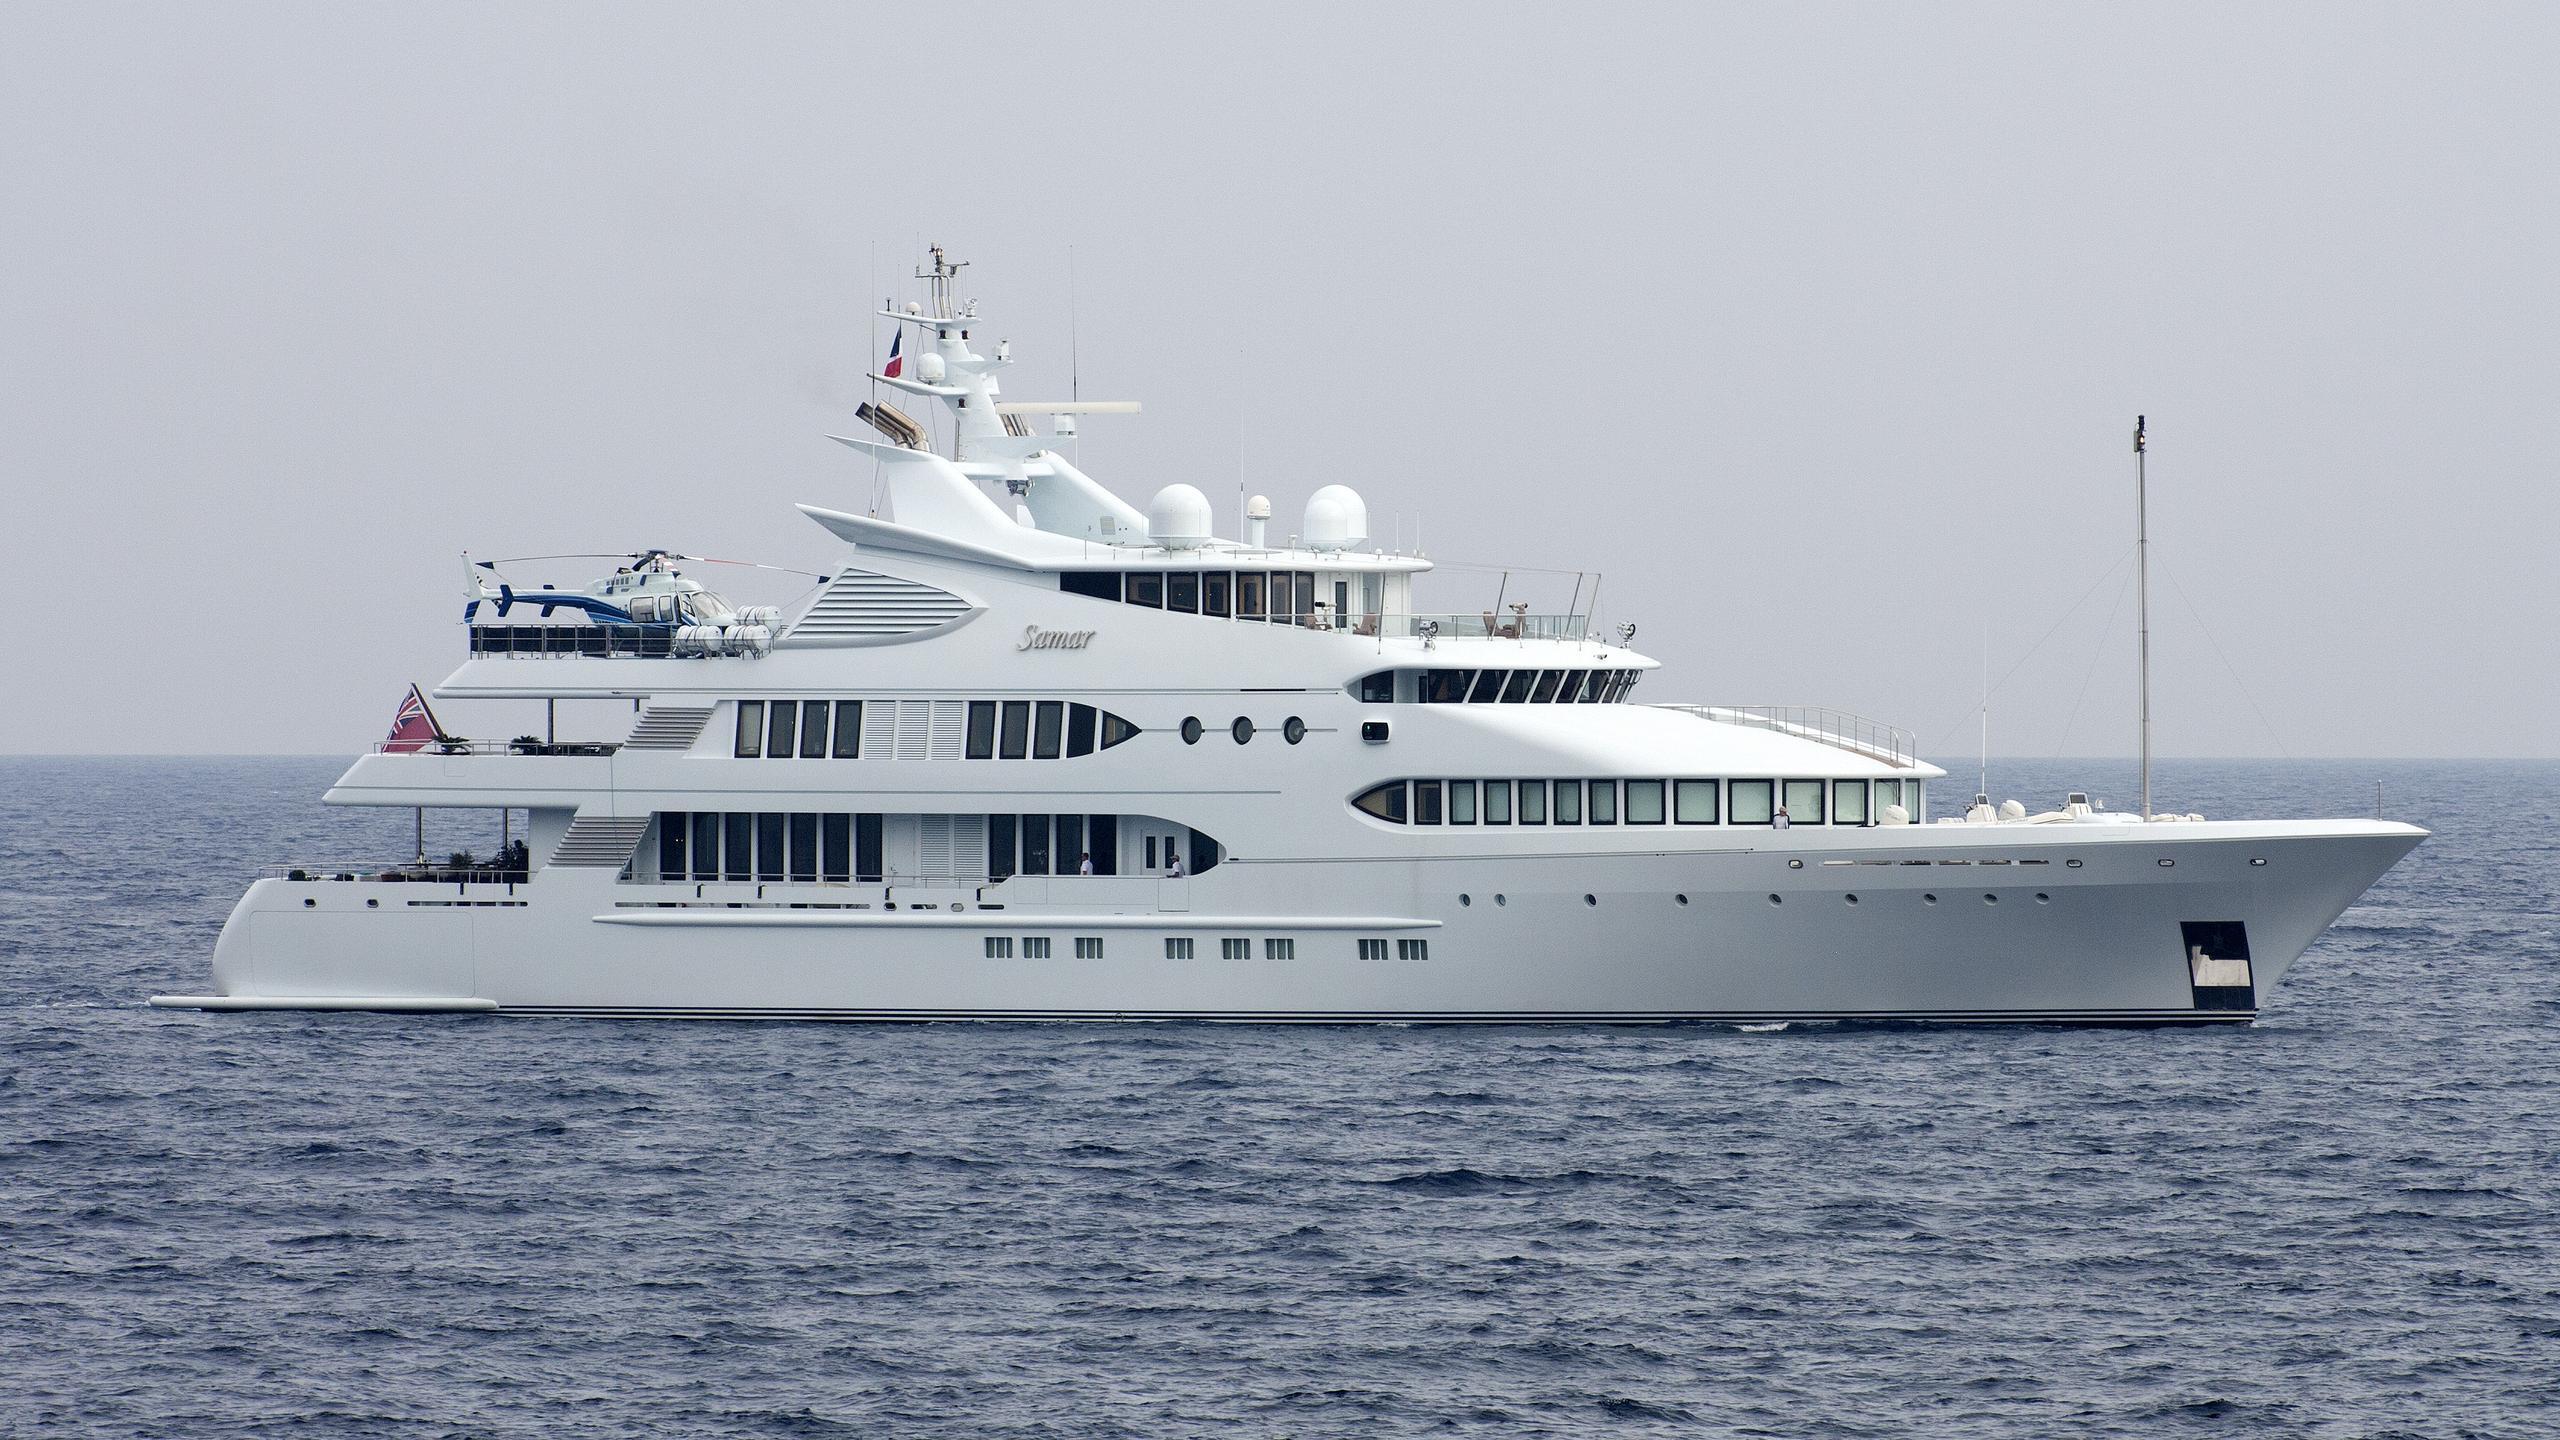 samar-yacht-exterior